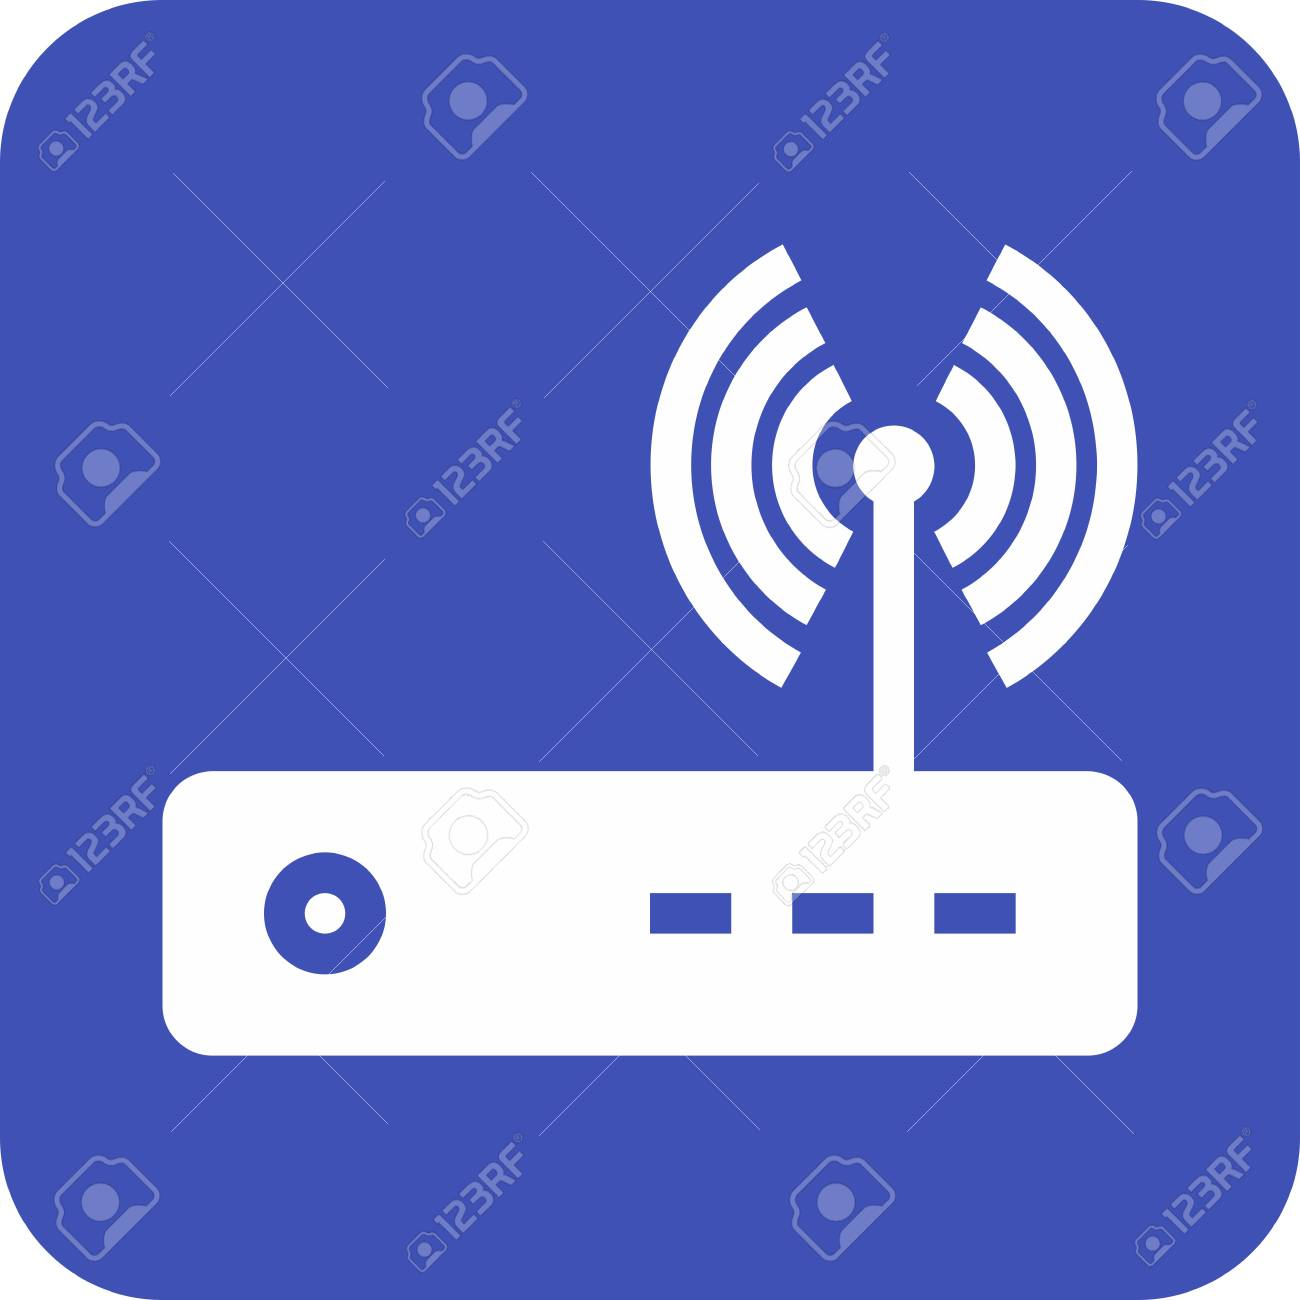 Router, modem hardware - 99018688